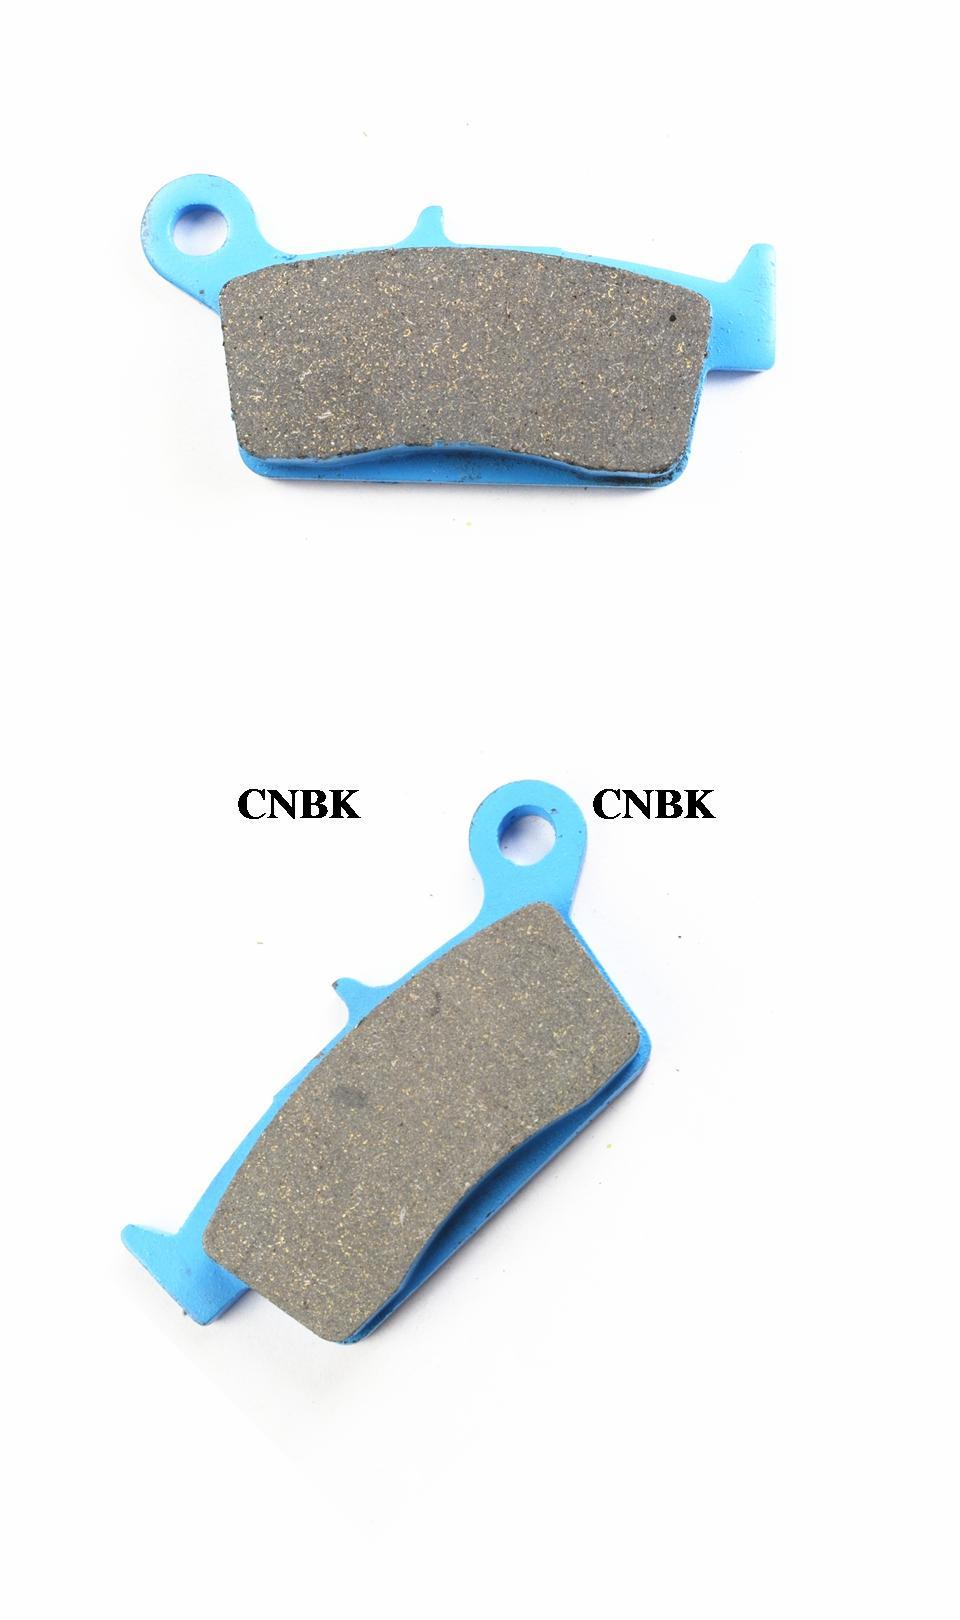 01 02 03 04 05 Semi-Metallic Front Disc Brake Pads for KYMCO 50 Cobra Cross / Racer Cobra50 2000 - 2006 CNBK(China (Mainland))